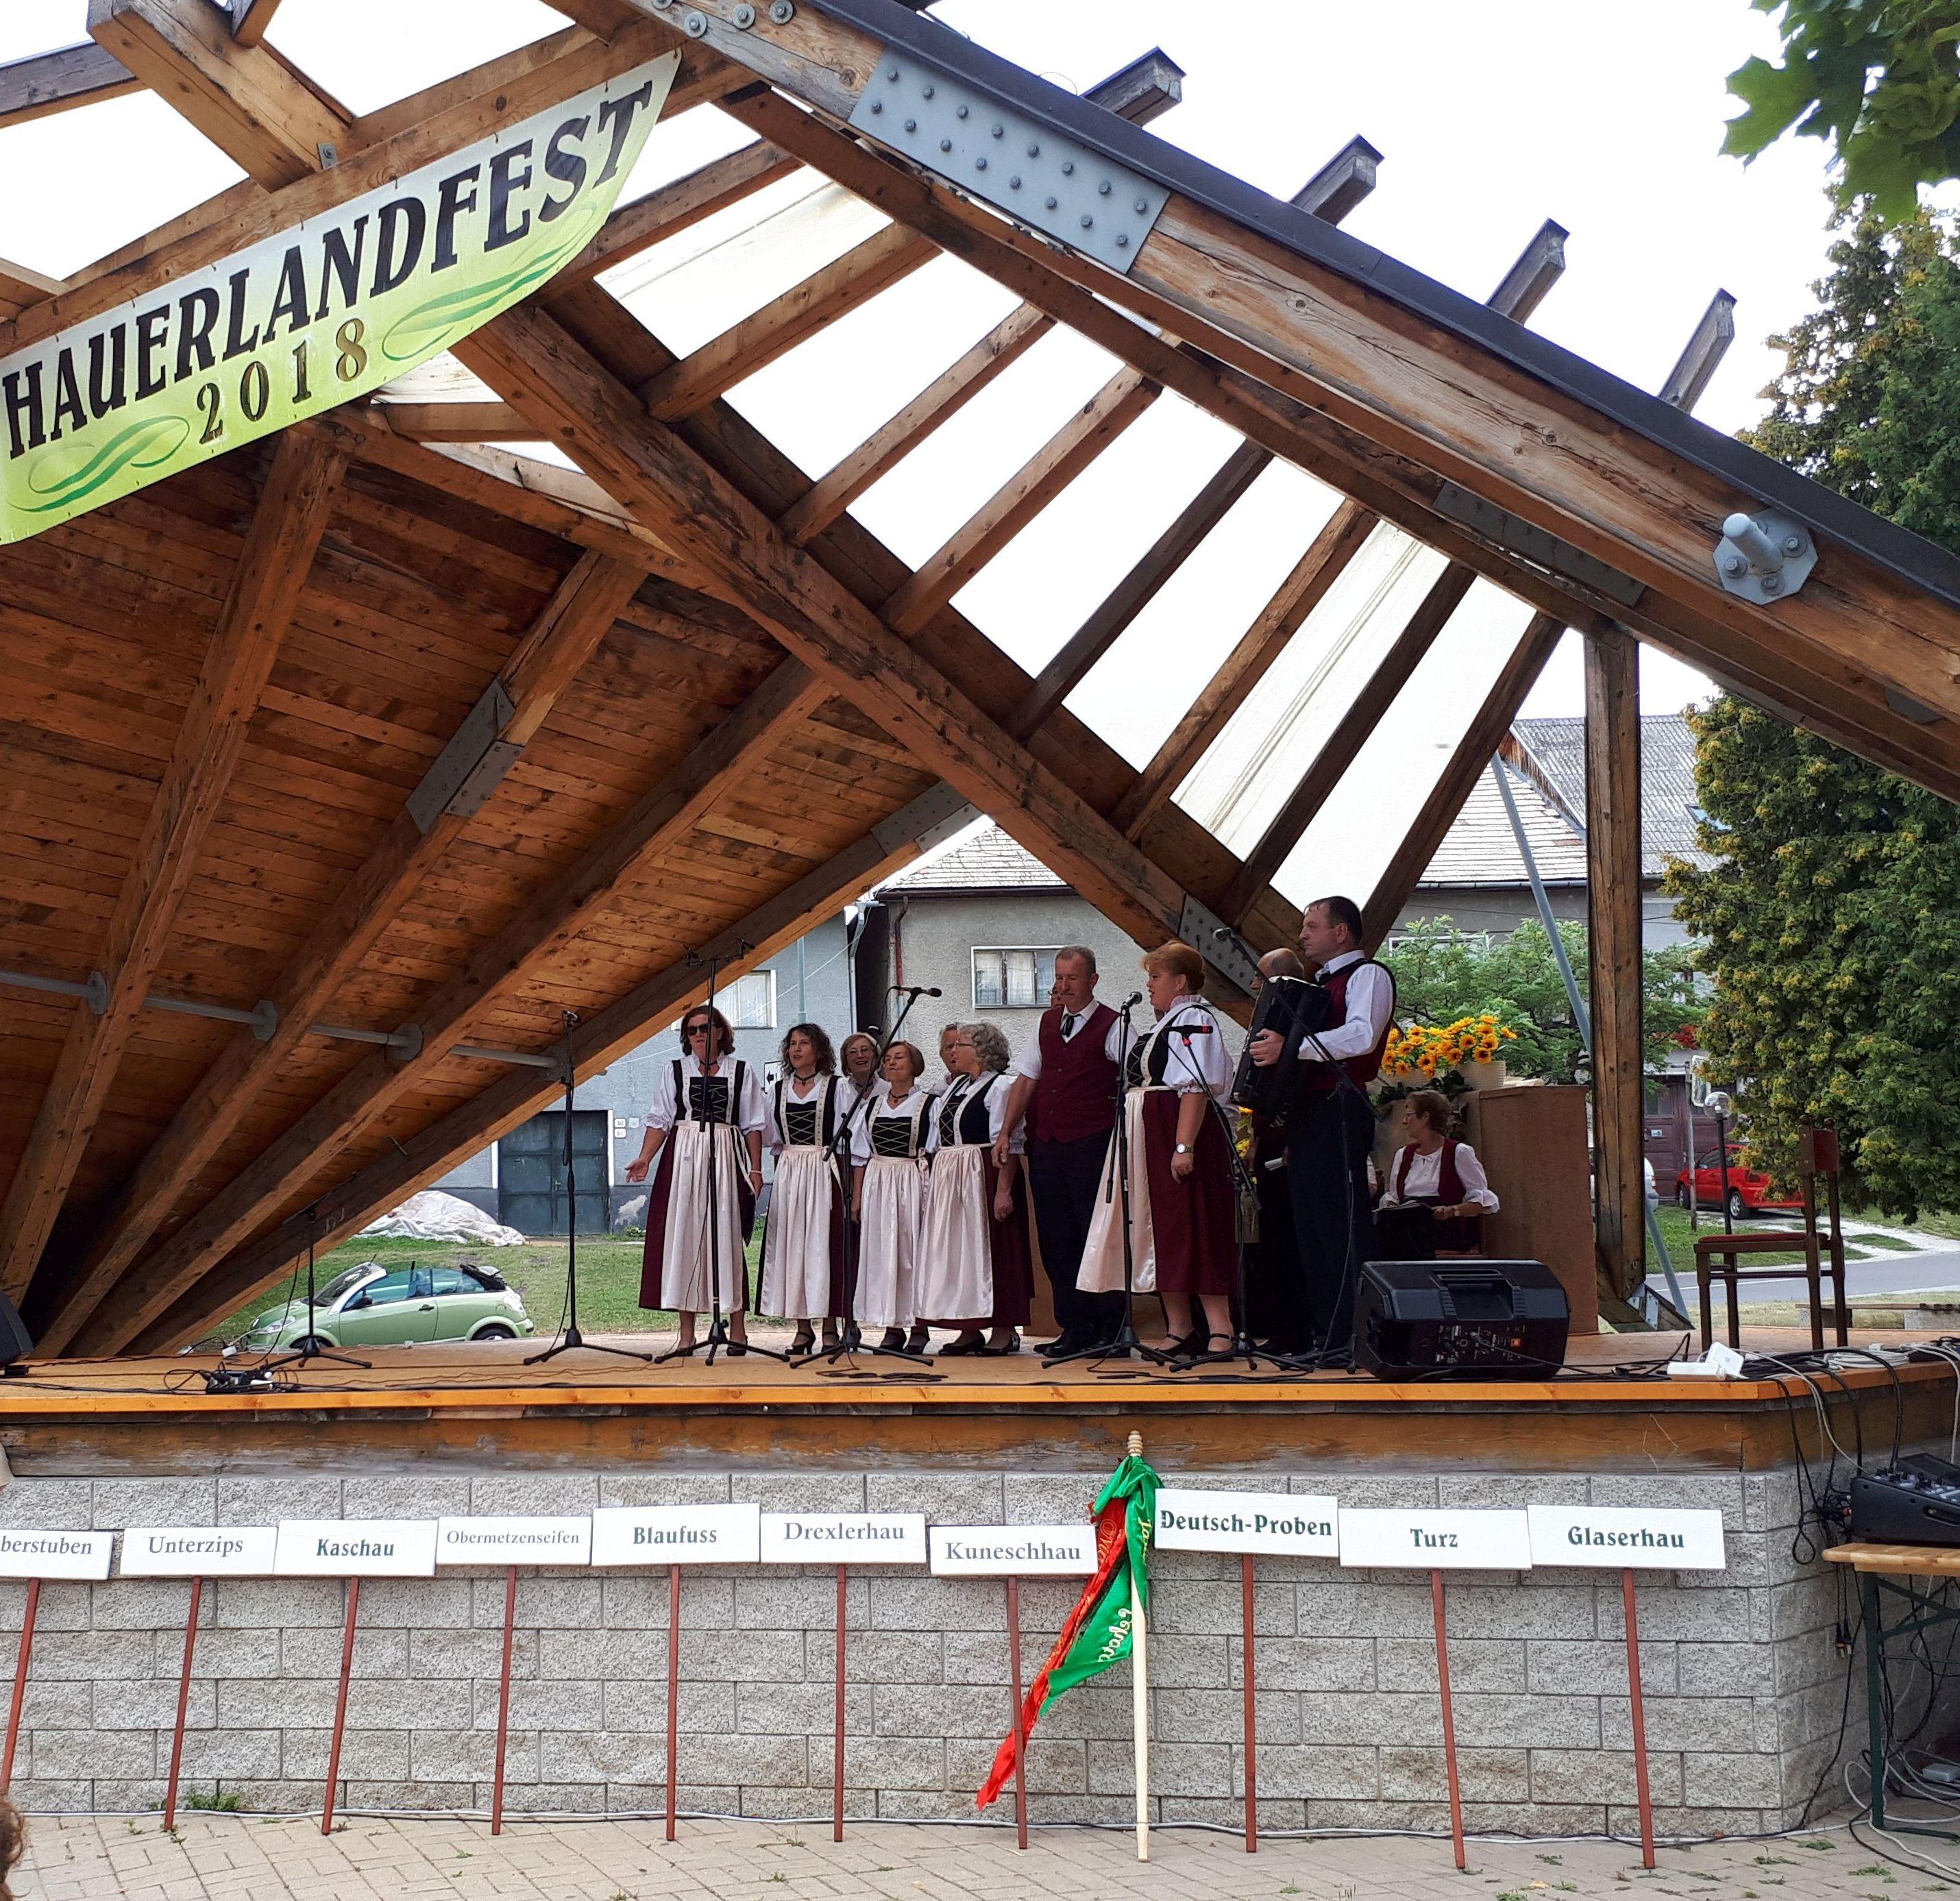 Neutrataler auf Hauerlandfest